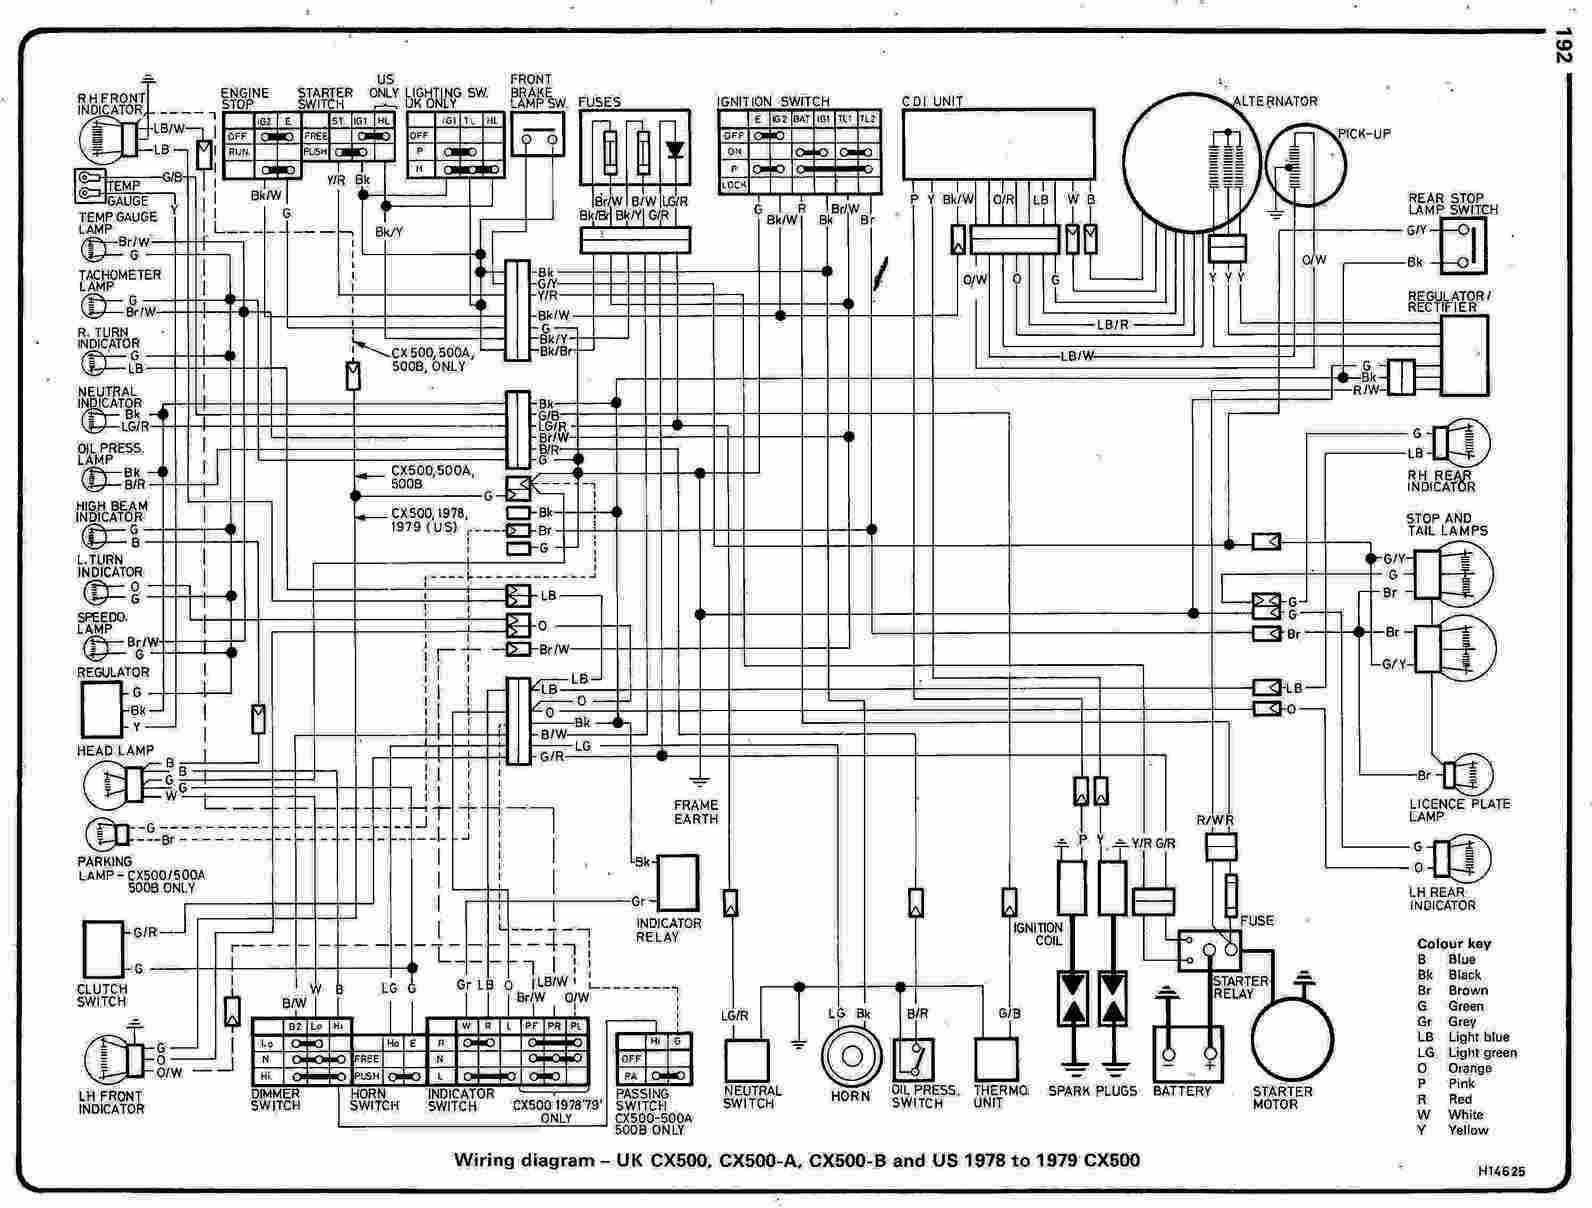 hight resolution of 81 honda wiring diagram wiring diagram blog 81 honda gl500 wiring diagram 81 honda wiring diagram